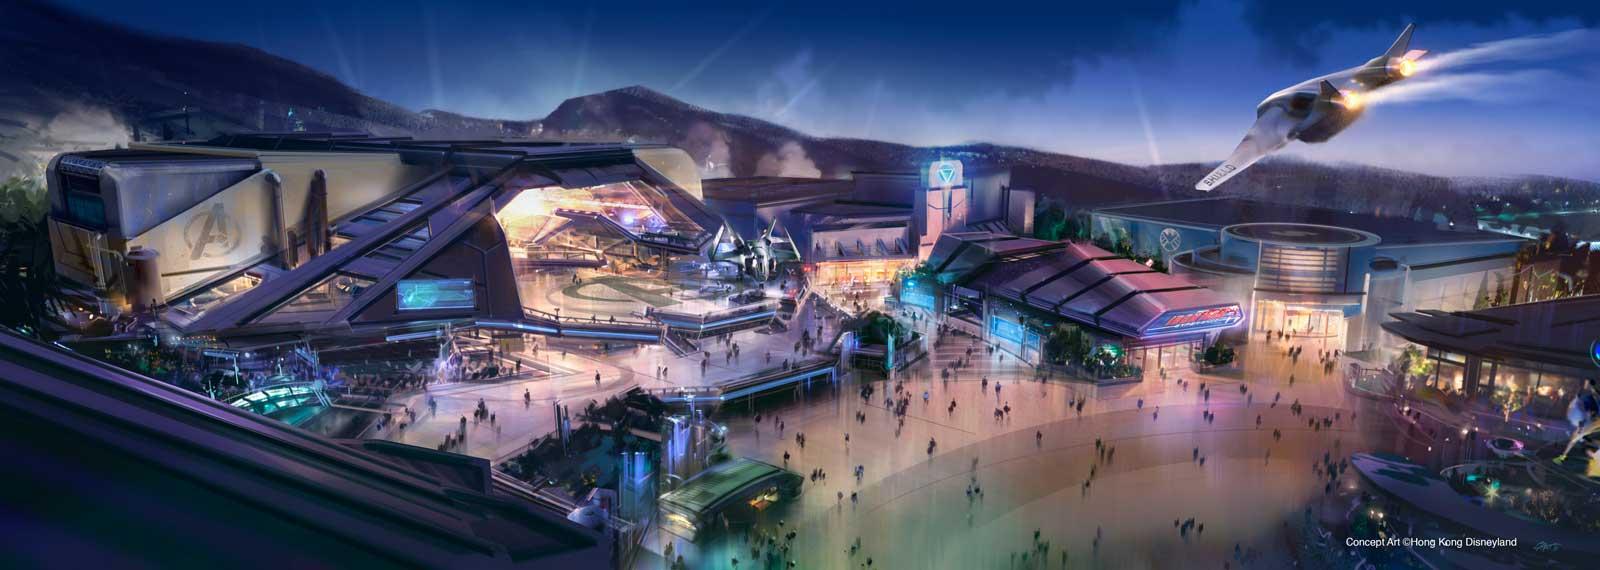 Hong Kong Disneyland Expansion - Marvel